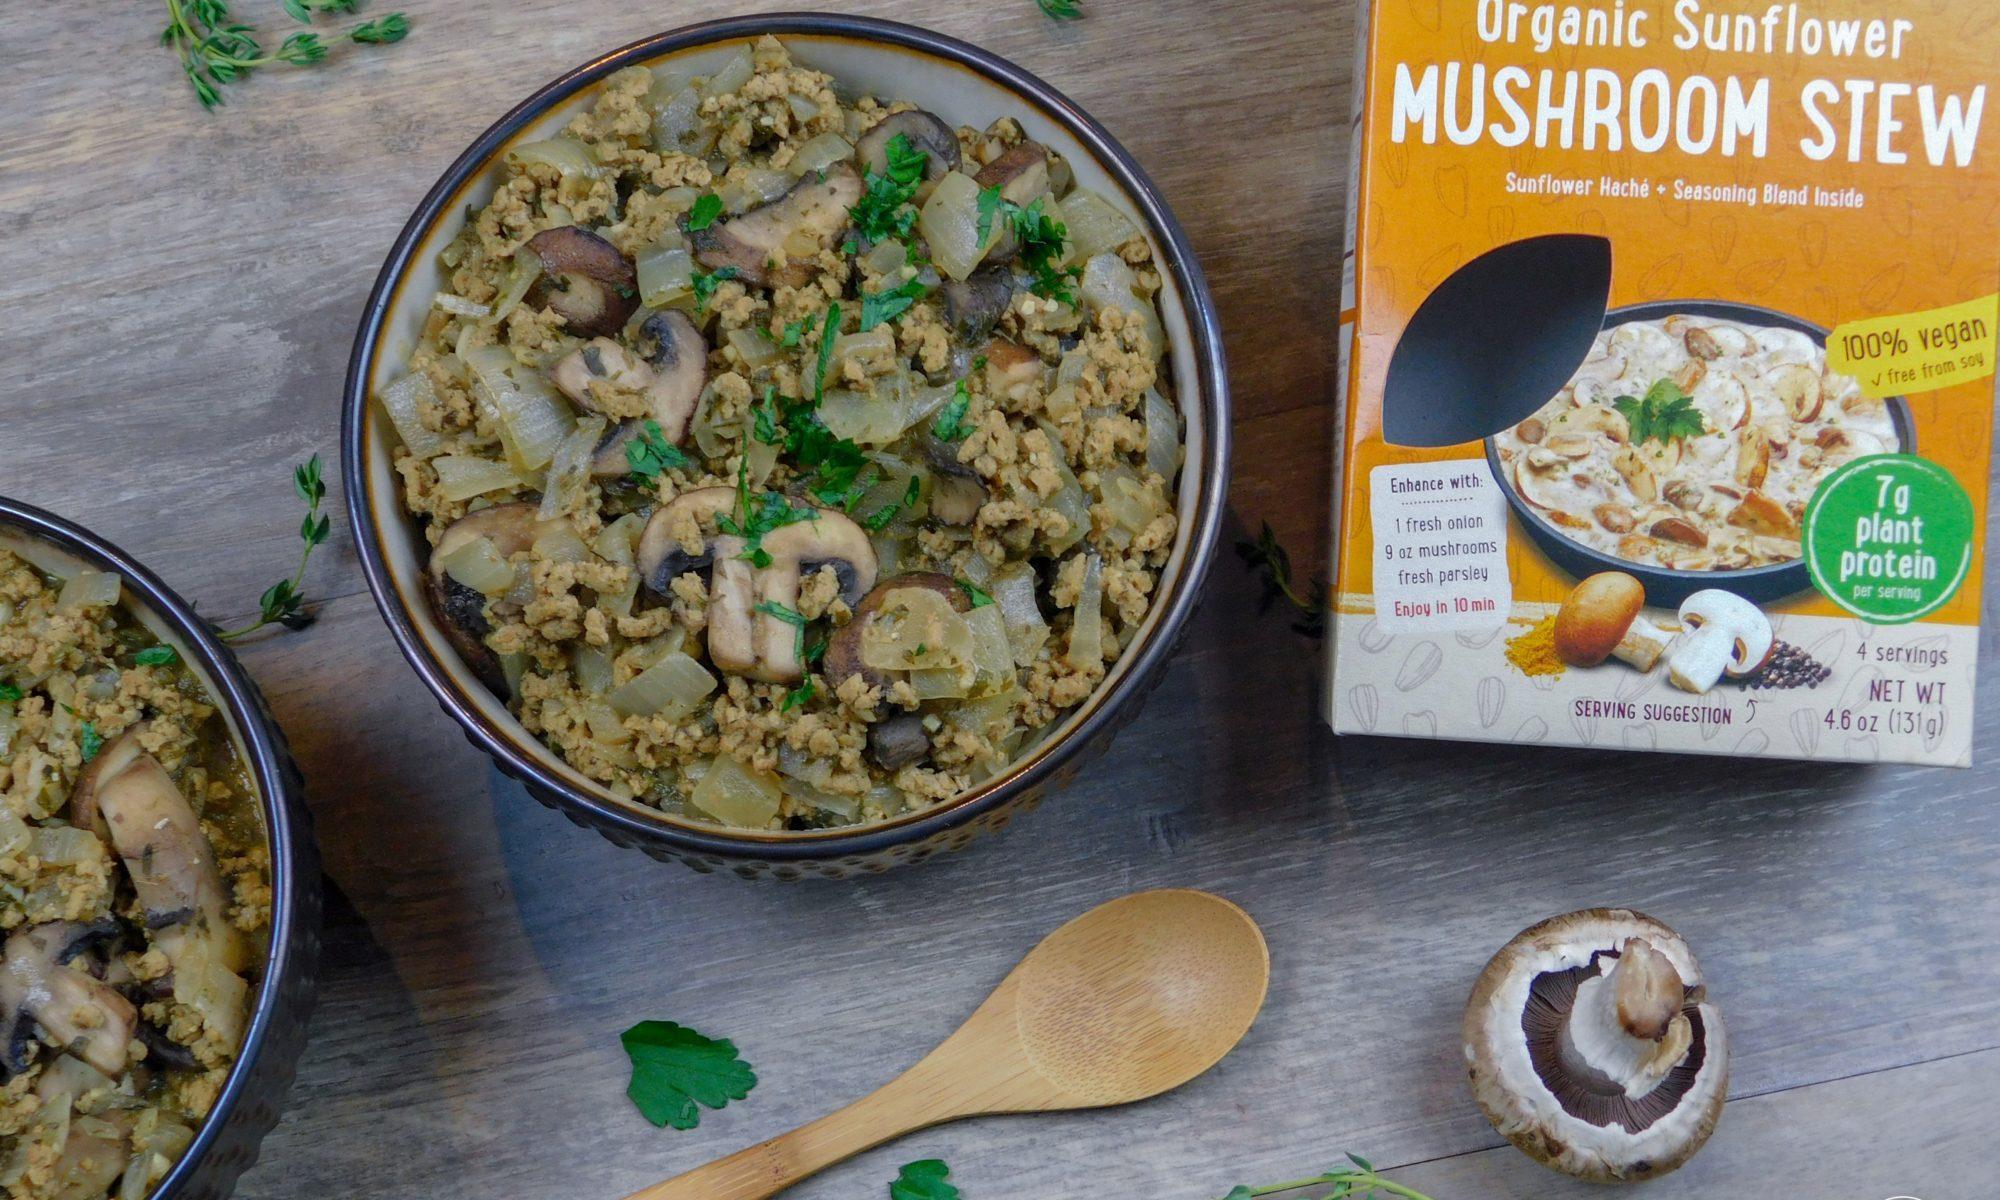 Earthy Mushroom Stew